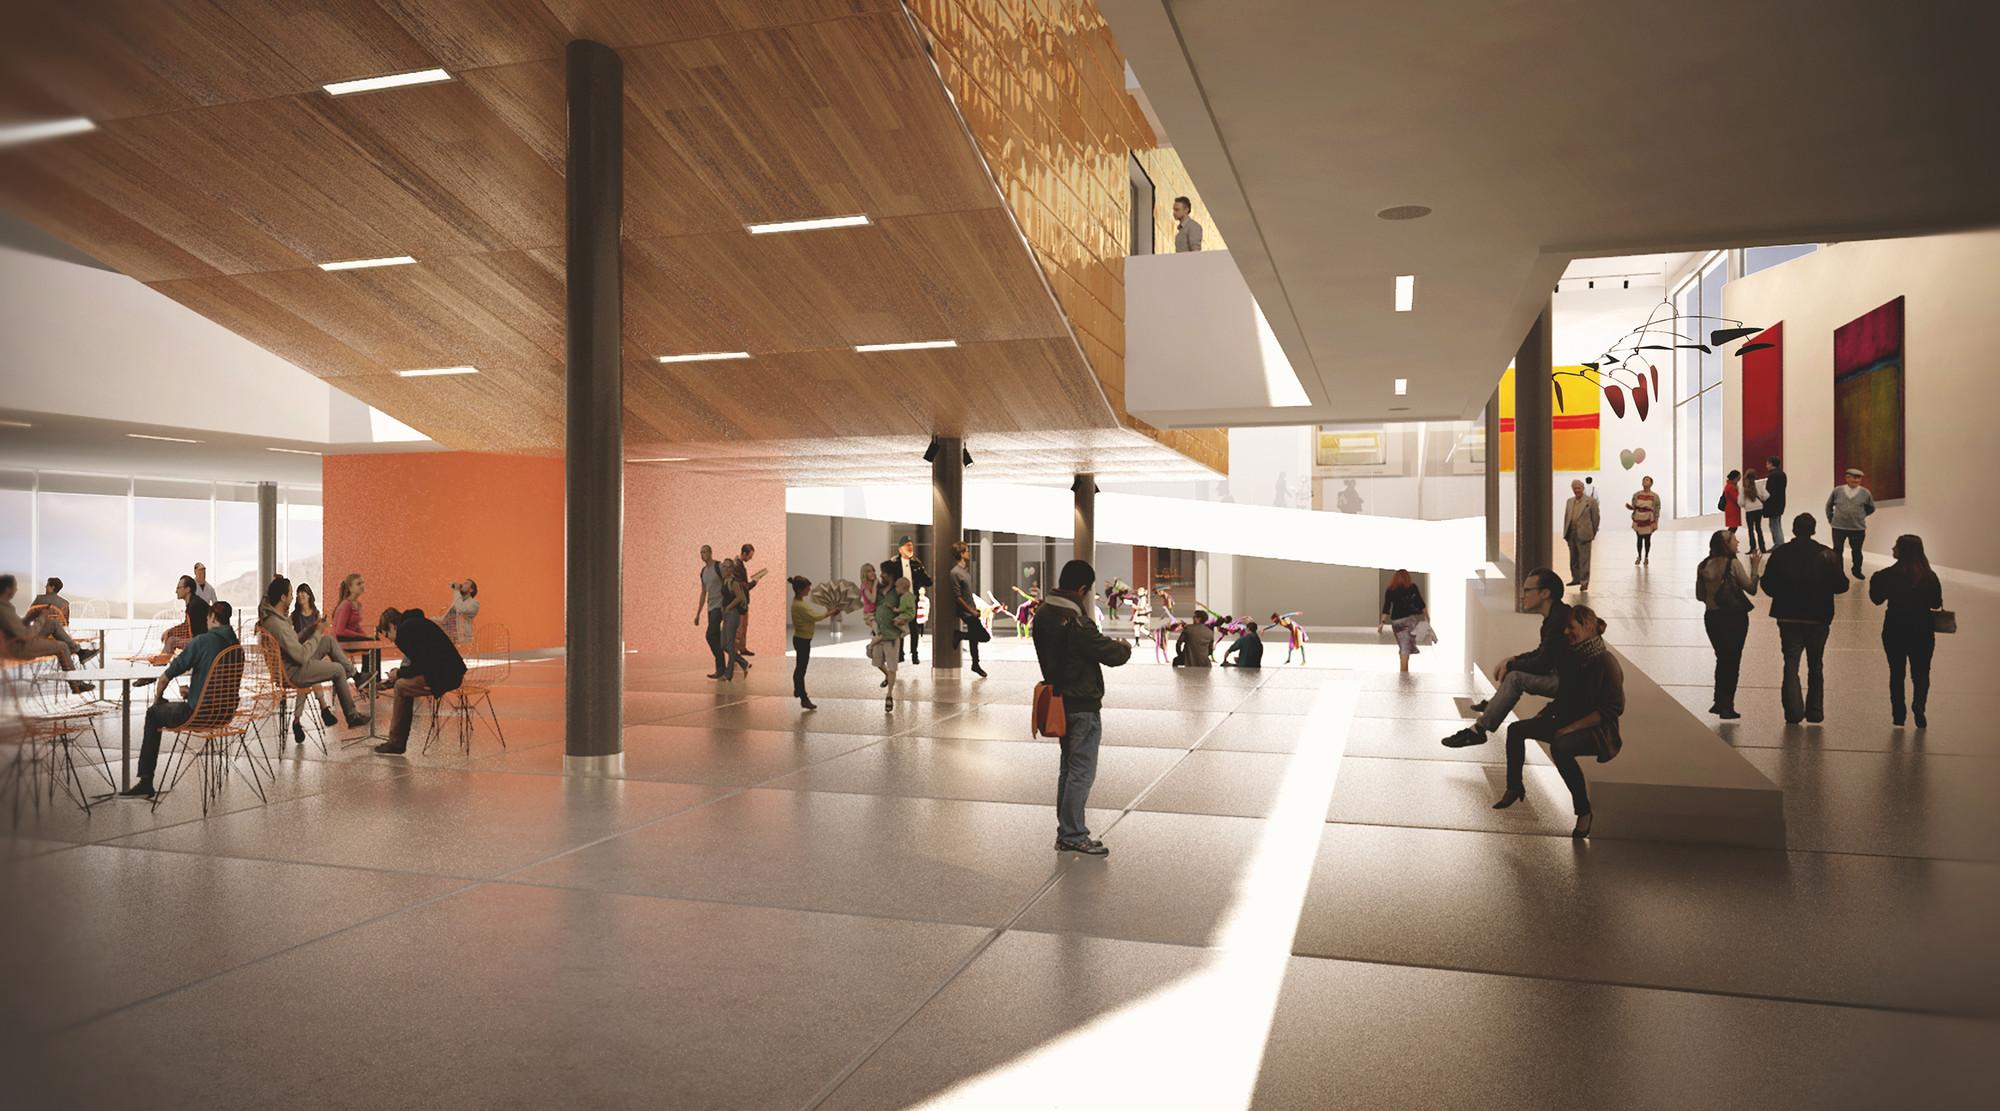 Arq. Marcelo Banderas, Arq.Victor Viteri, Arq. Hernan Castro. Image Courtesy of Diagonal Arquitectura